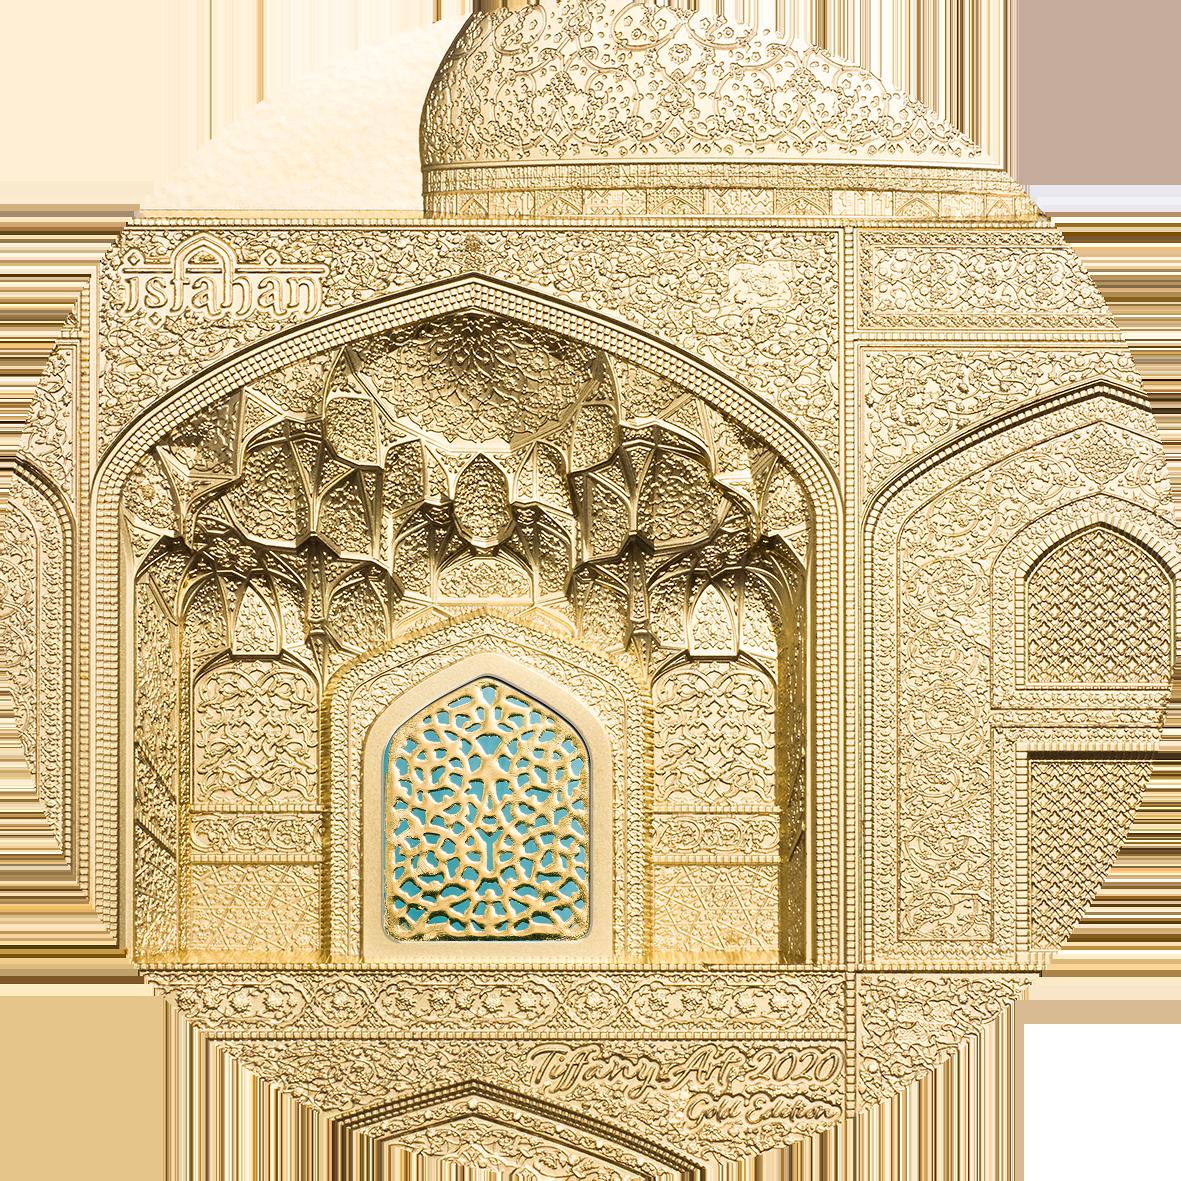 Palau - 2020 - 500 Dollars - Tiffany Art Isfahan Gold